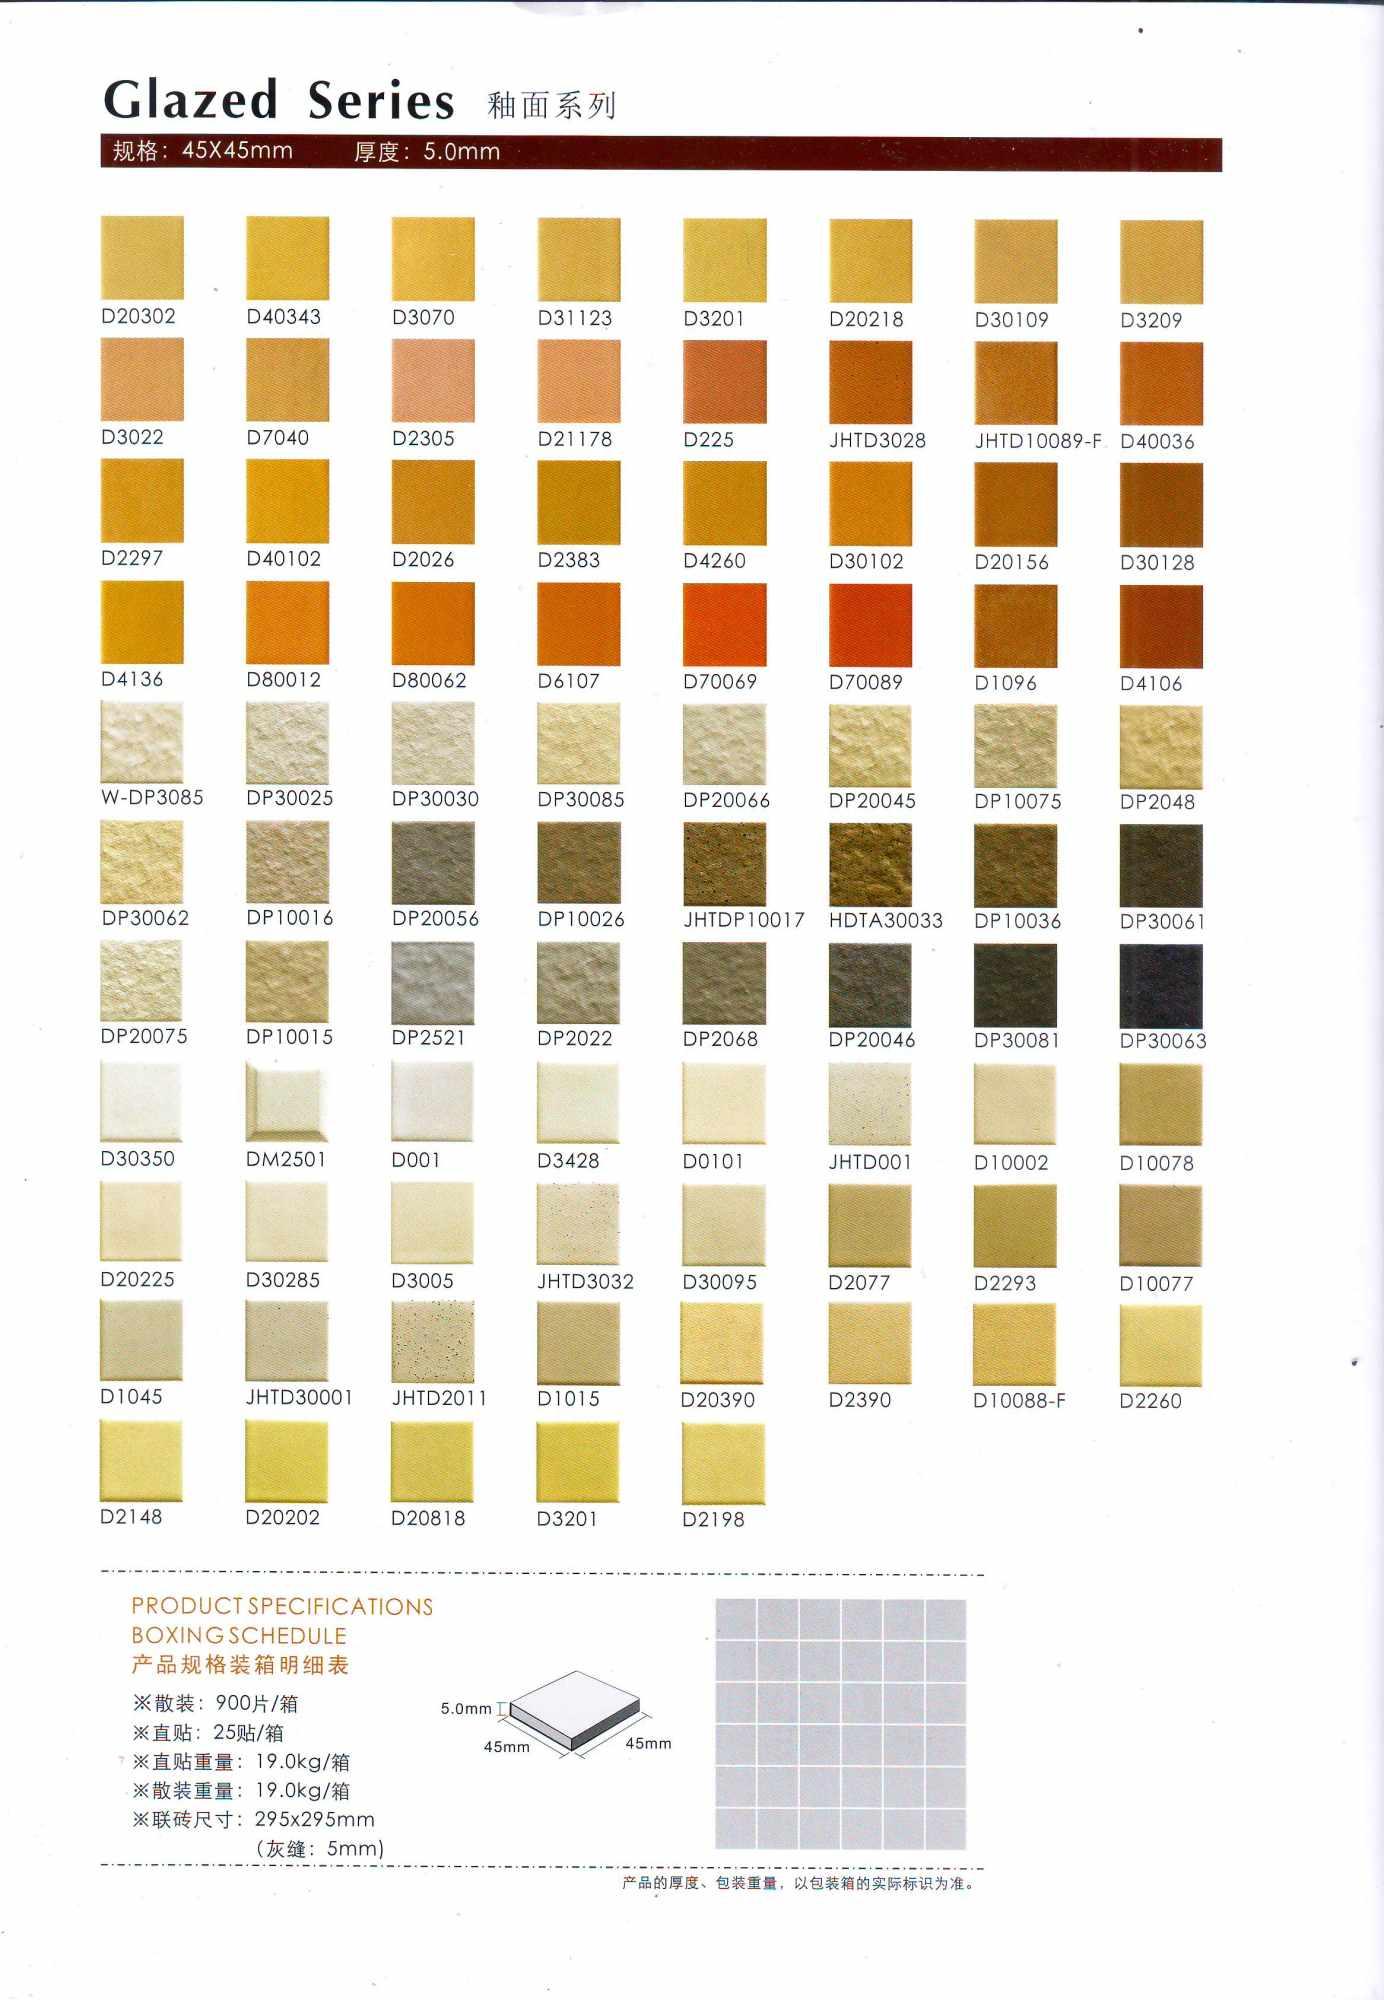 Ceramic Mosaic tile for 1 pack D2148 45mmx45mm